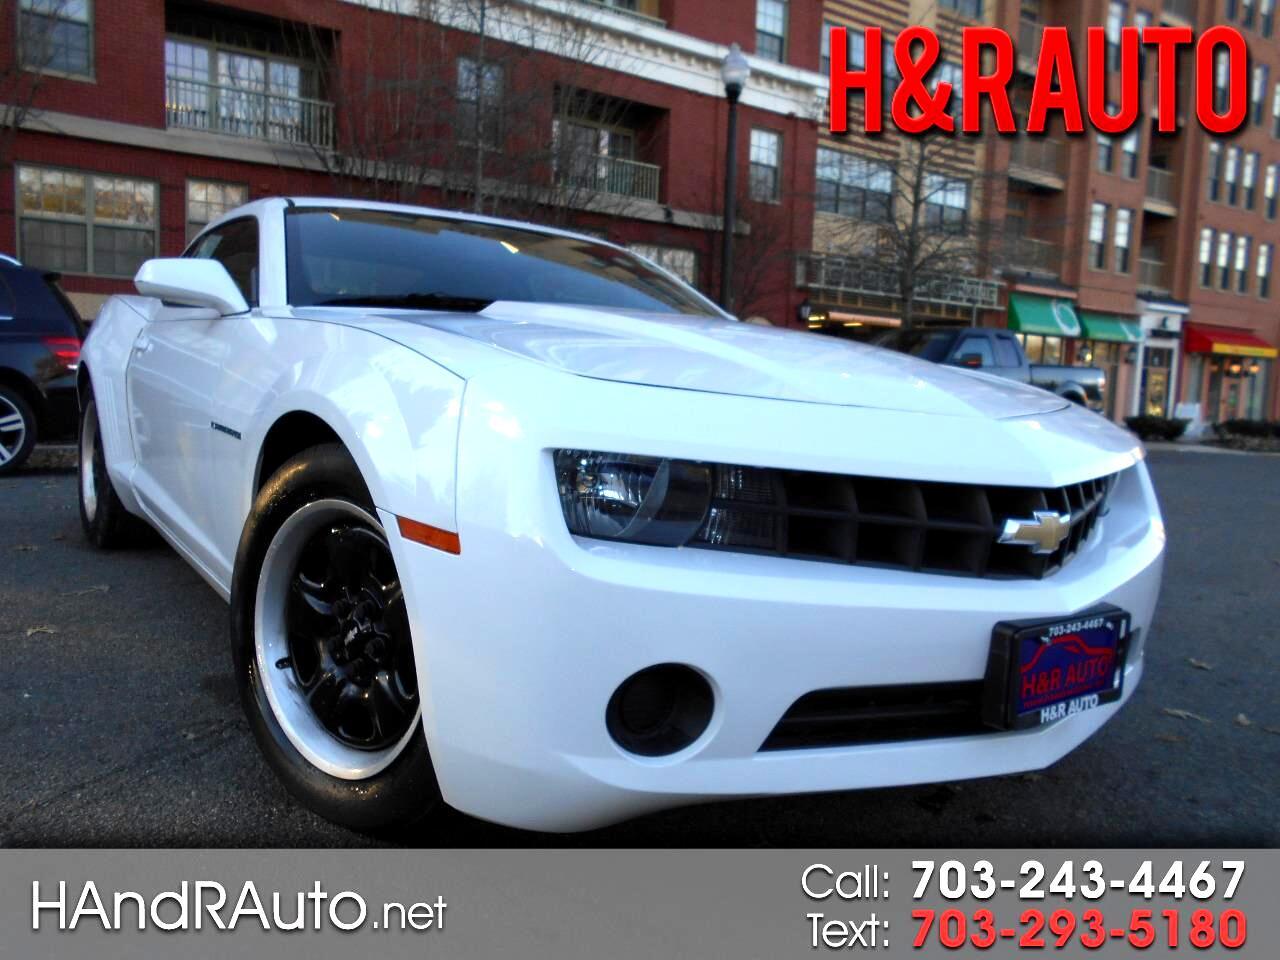 2013 Chevrolet Camaro 2dr Cpe LS w/2LS